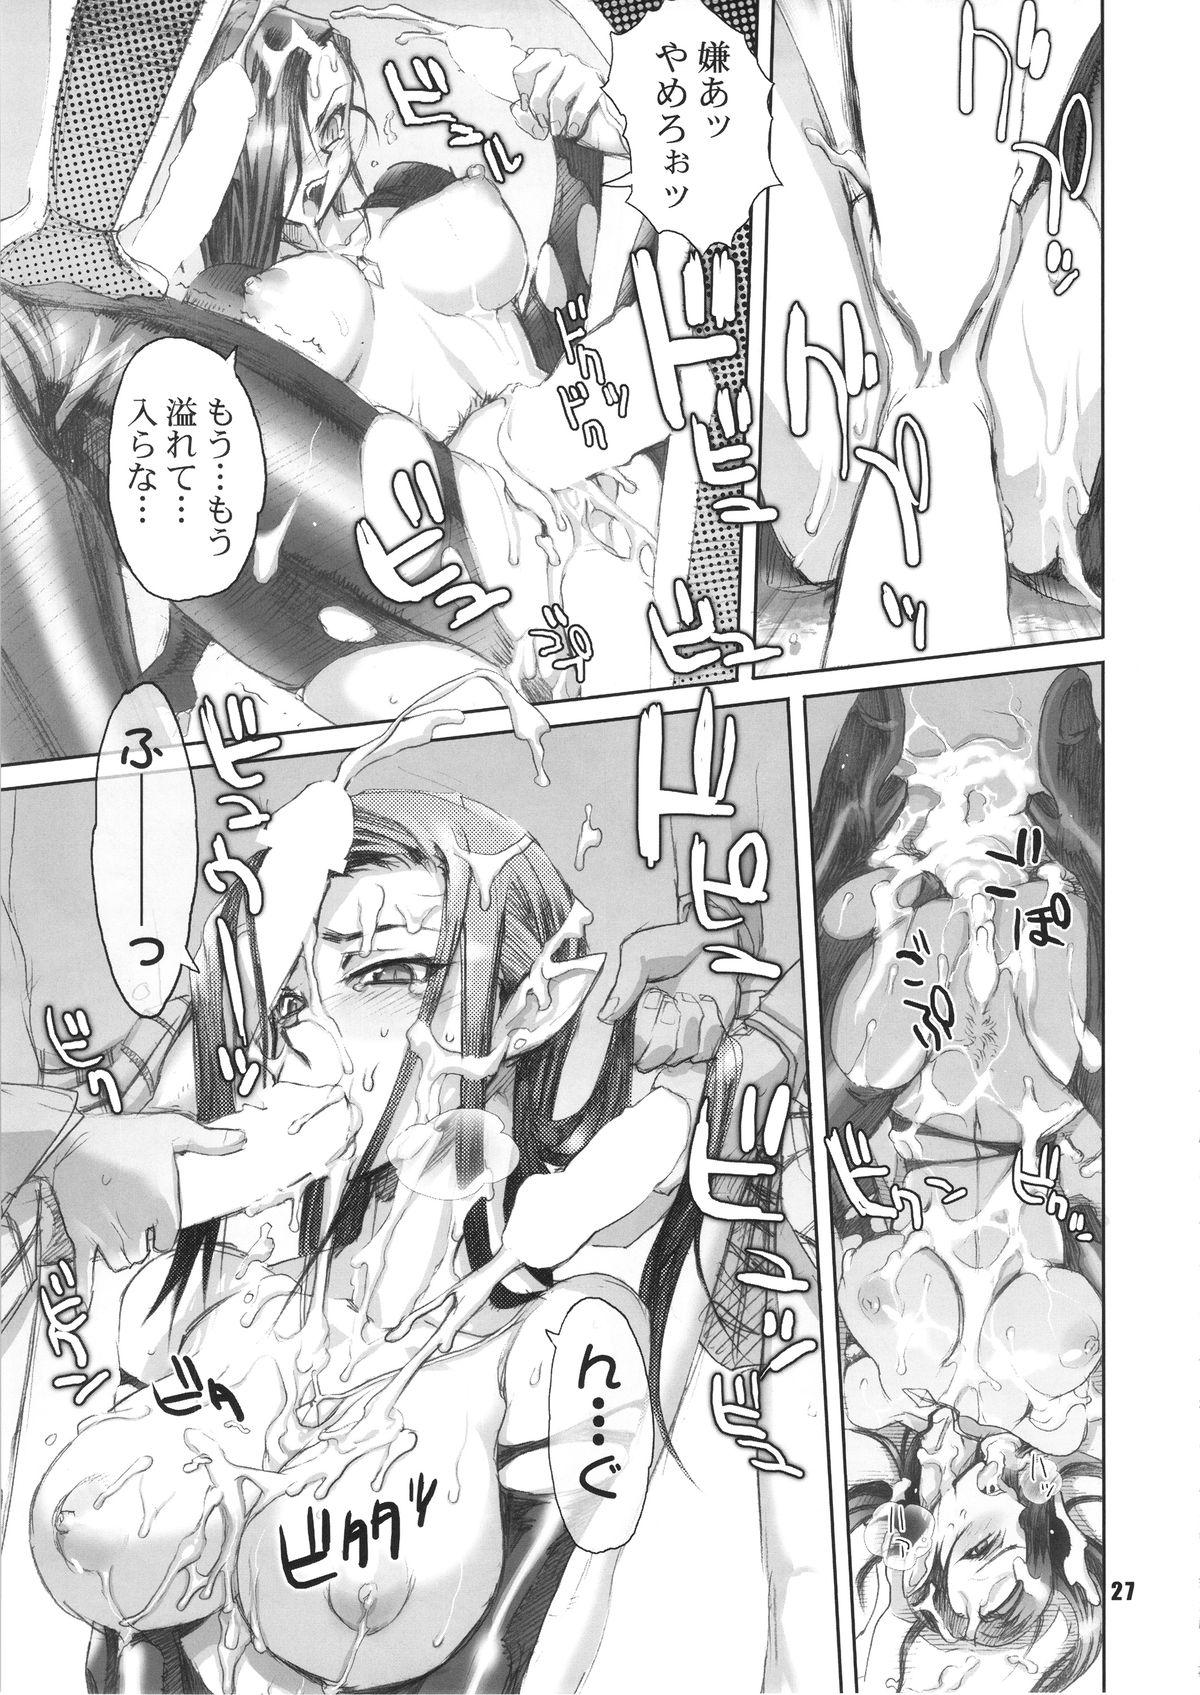 Inazuma Pretty Warrior 25